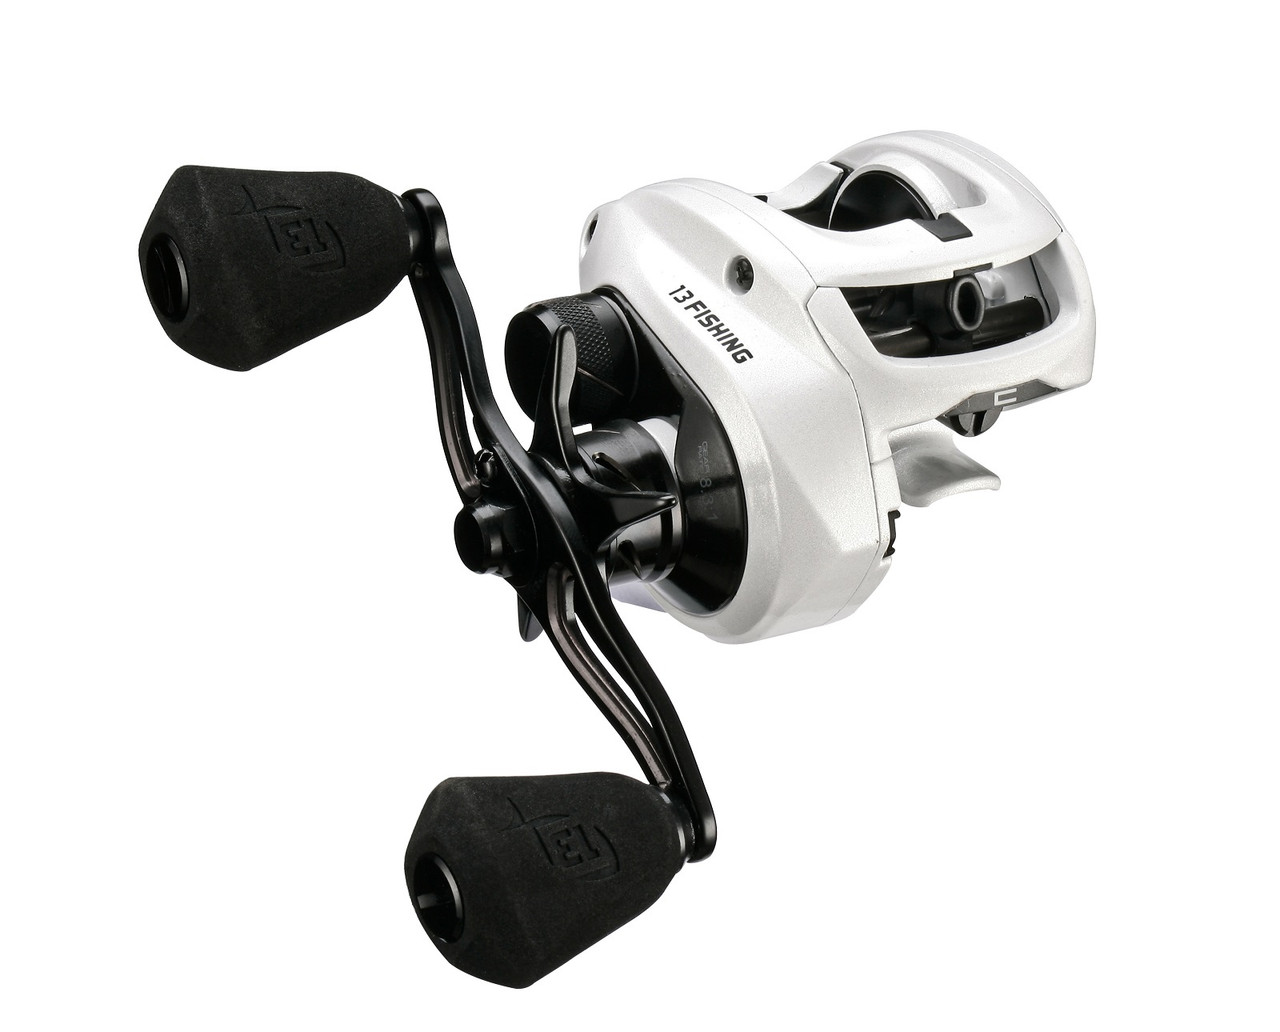 13 Fishing Concept C Gen2 Bait Casting Fishing Reel